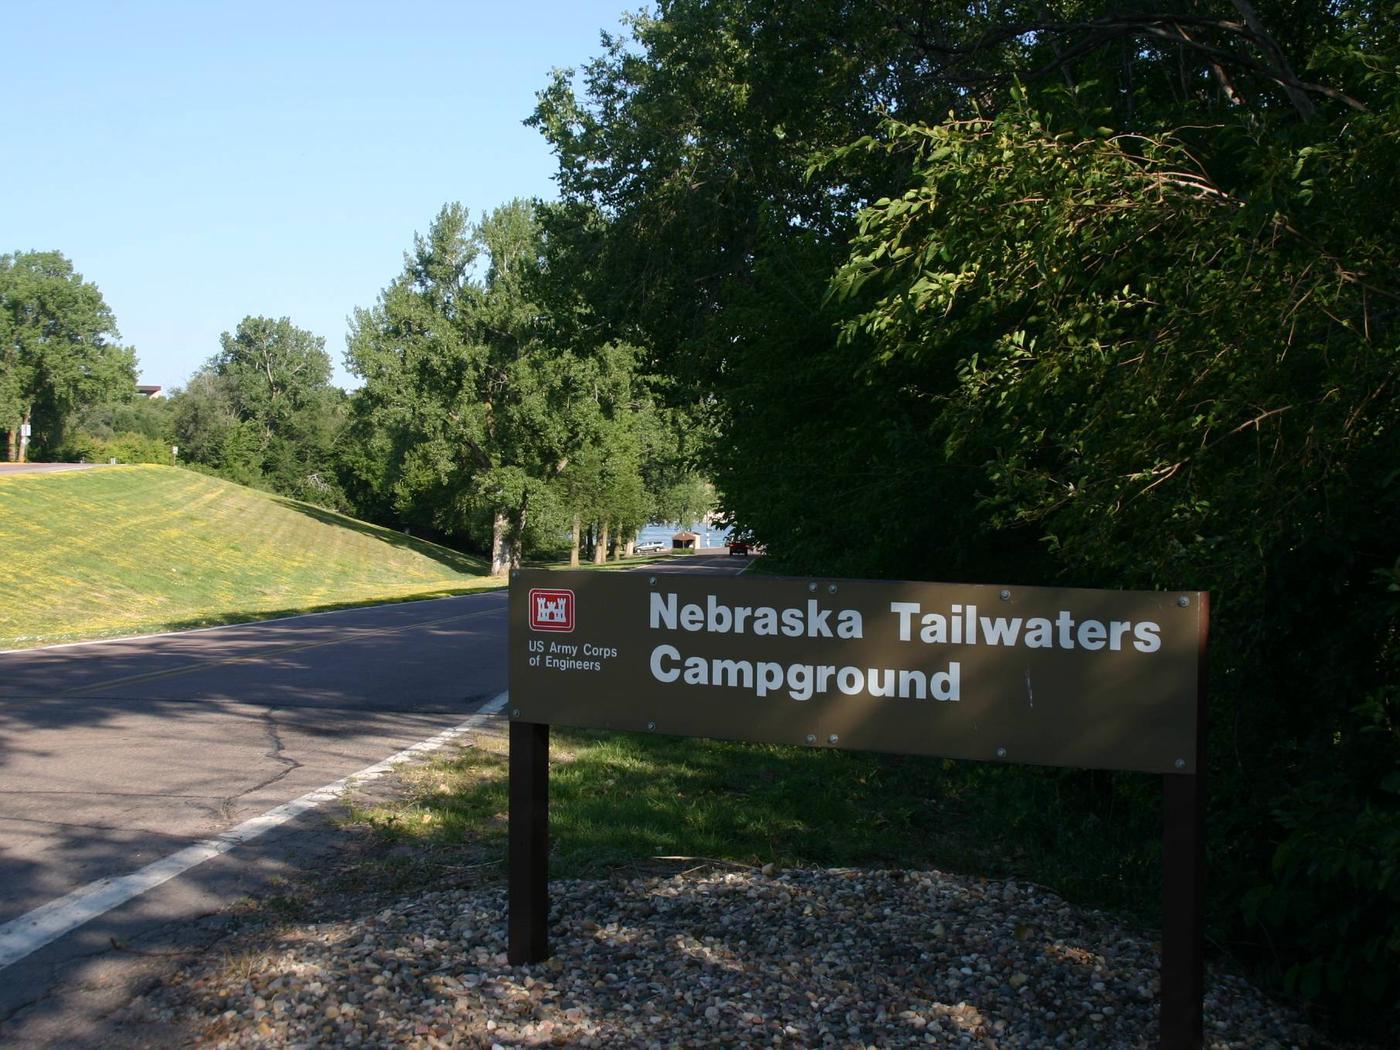 Nebraska Tailwaters Campground